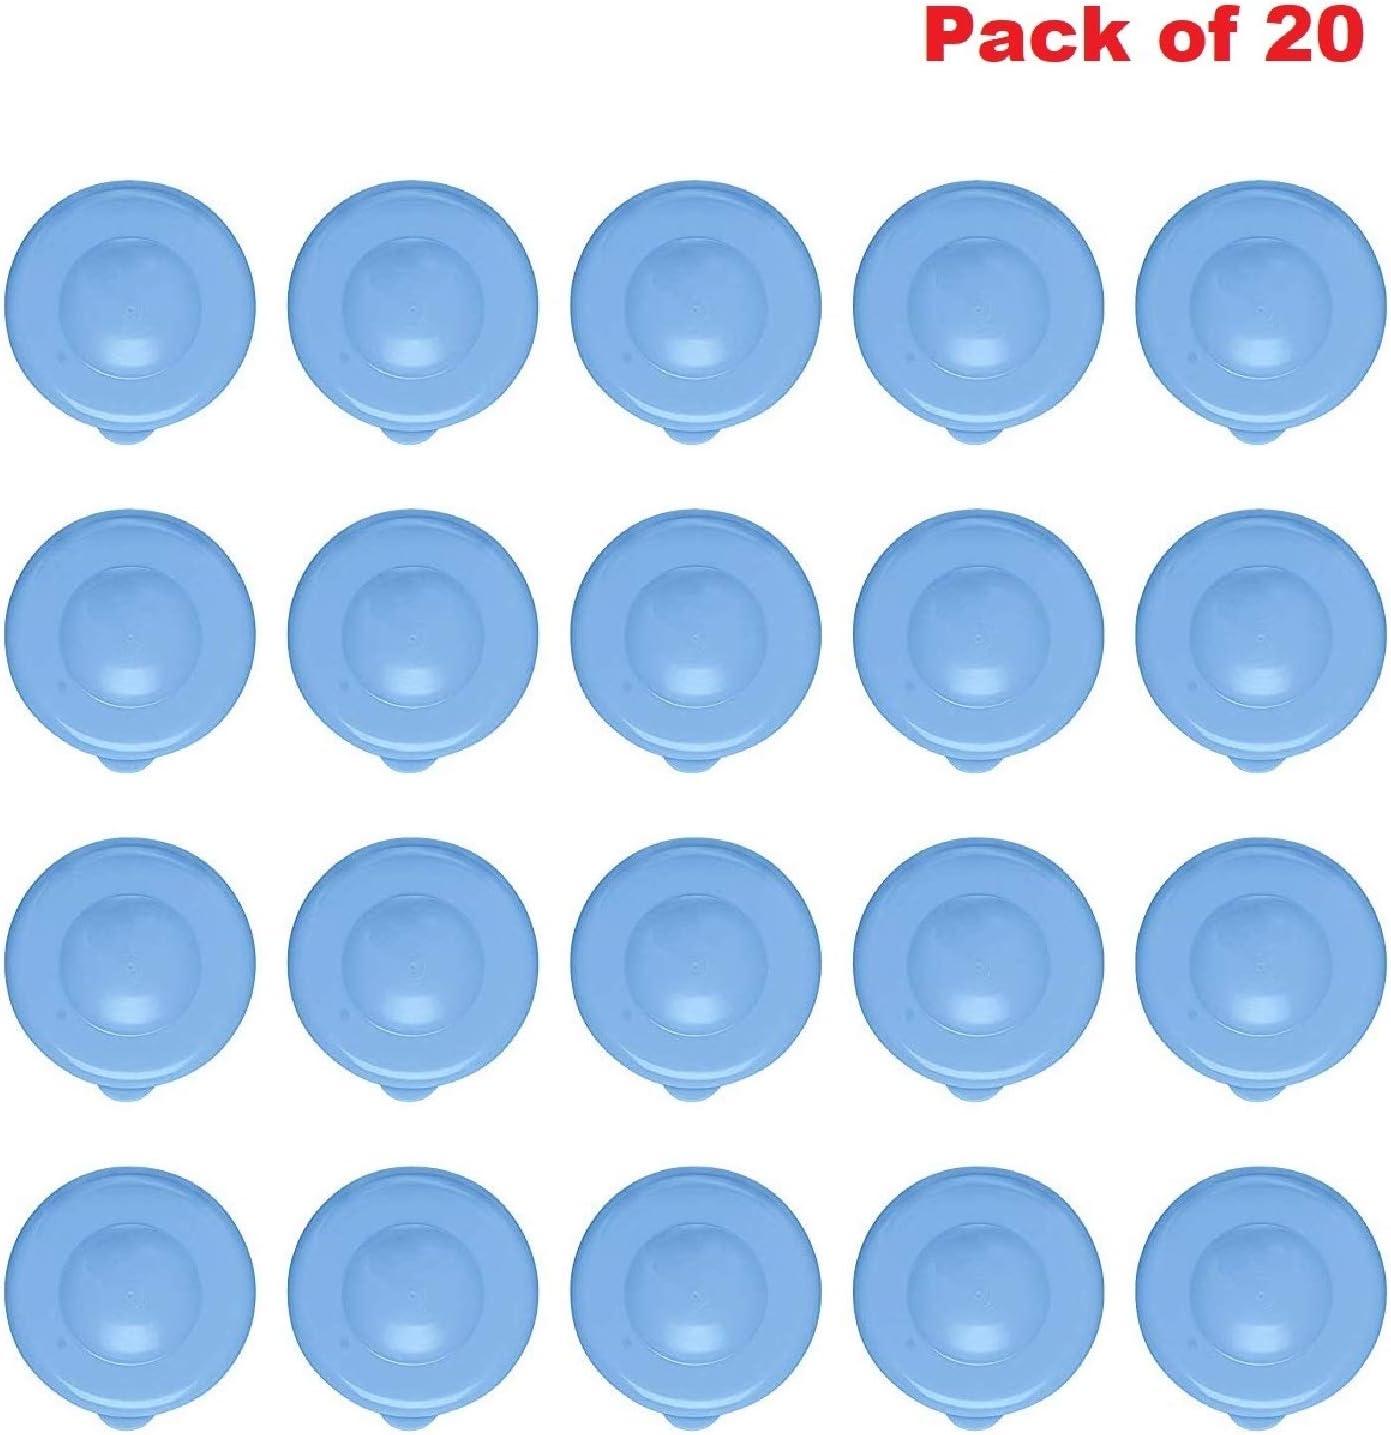 55mm Snap On Crown Top Fit 3 /& 5 Gallon Water Bottles Snug /& Tight Leak Proof Reusable BPA-Free Jug Lids 3 Dew Caps AquaNation Dew Cap Replacement